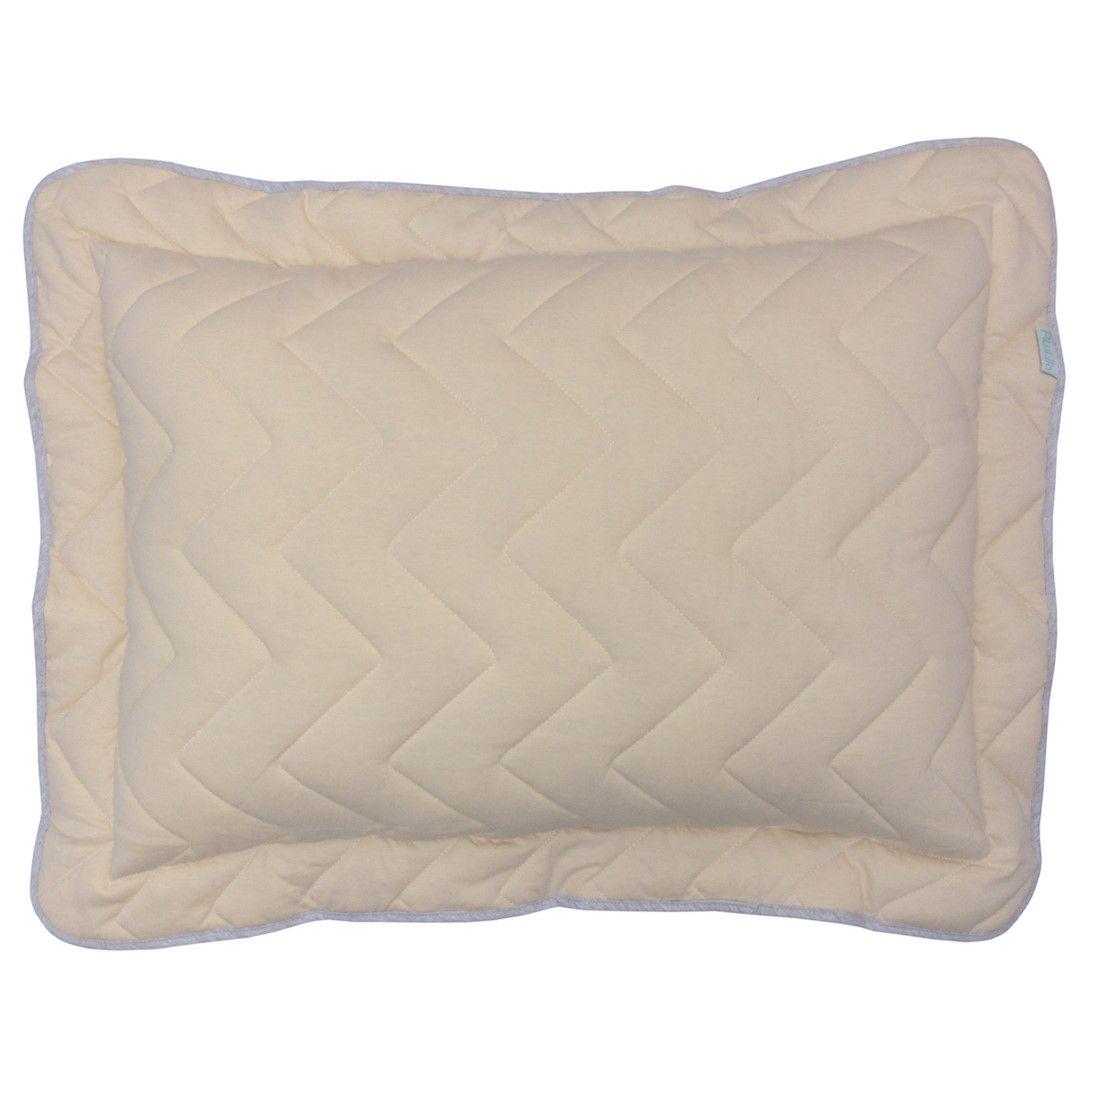 Porta travesseiro em malha chevron 70x50cm palha